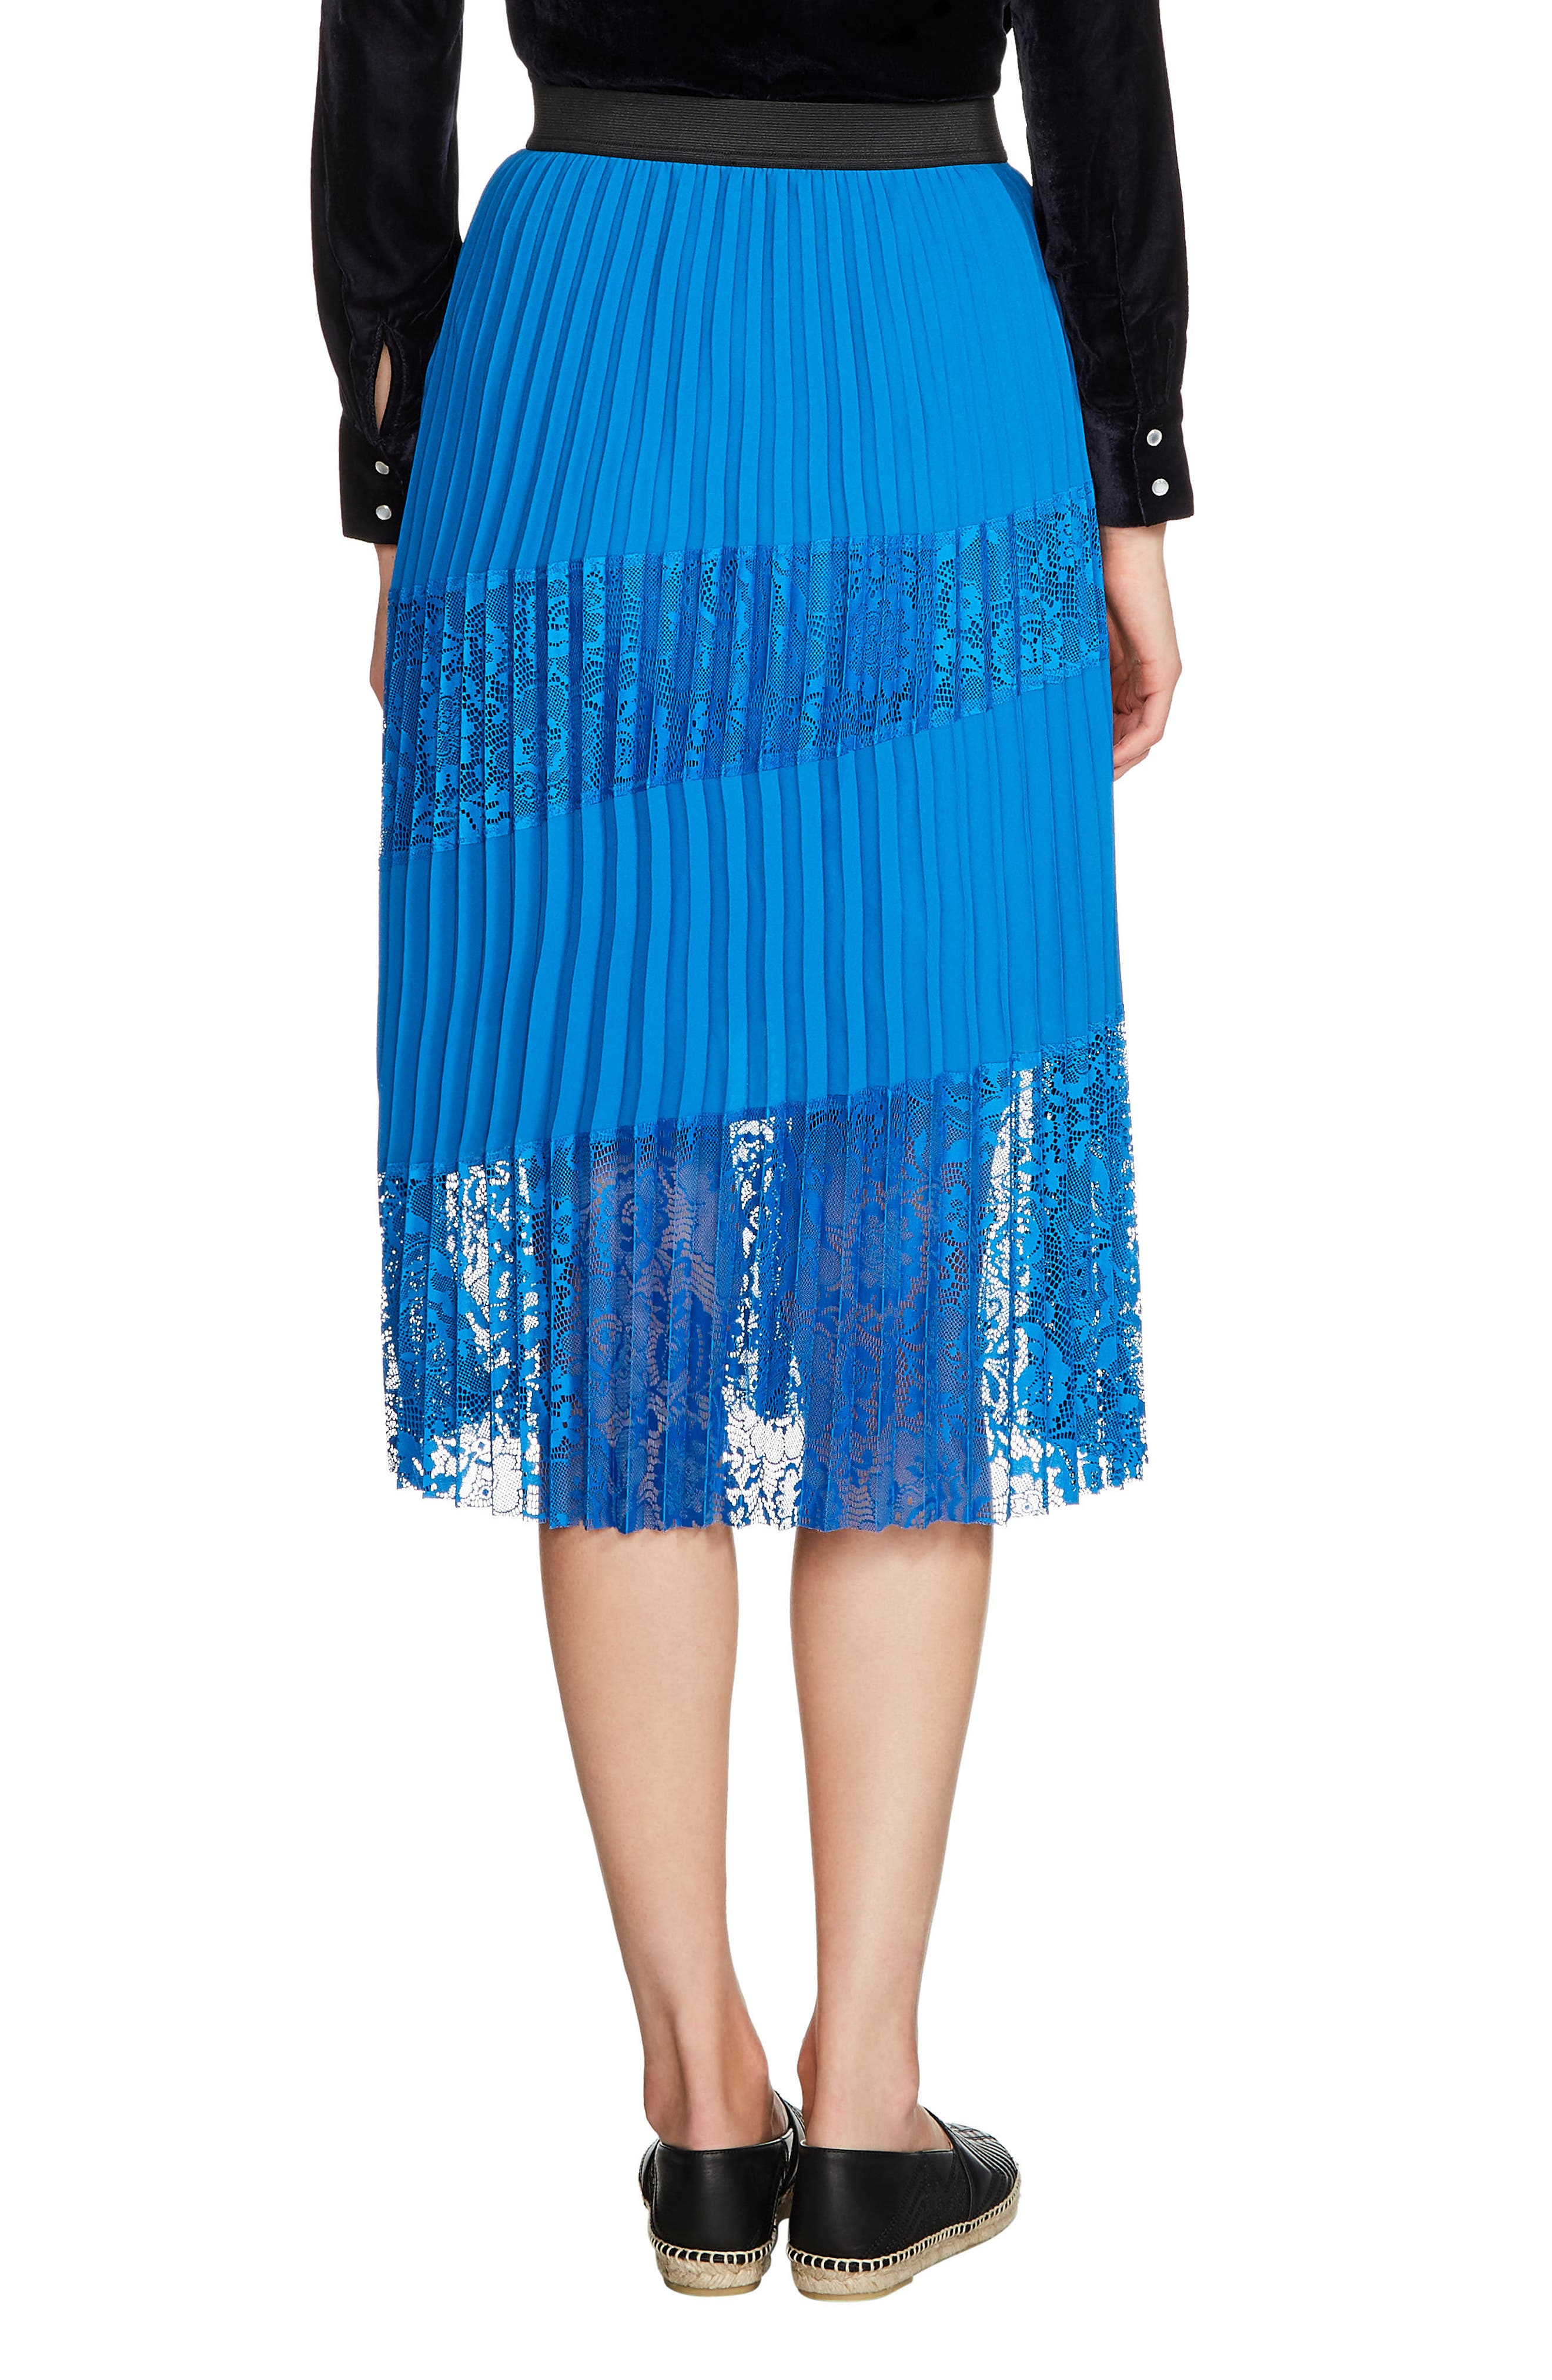 Jarane Lace Inset Pleated Midi Skirt,                             Alternate thumbnail 2, color,                             401